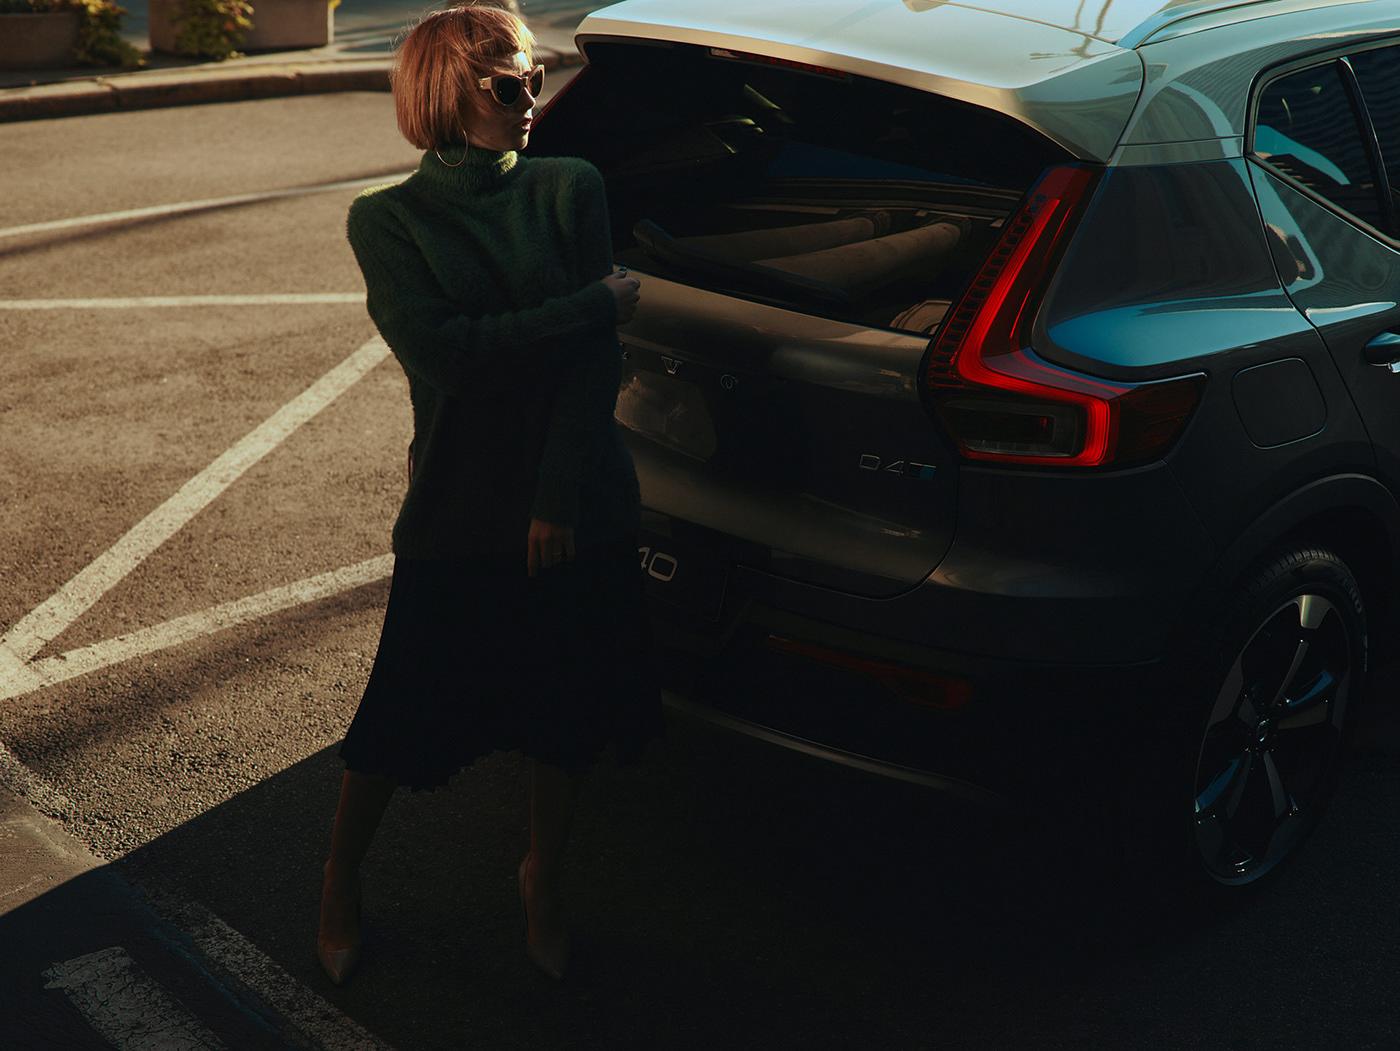 automotive   Chiaroscuro Urban city car redhead woman stylish Volvo xc40